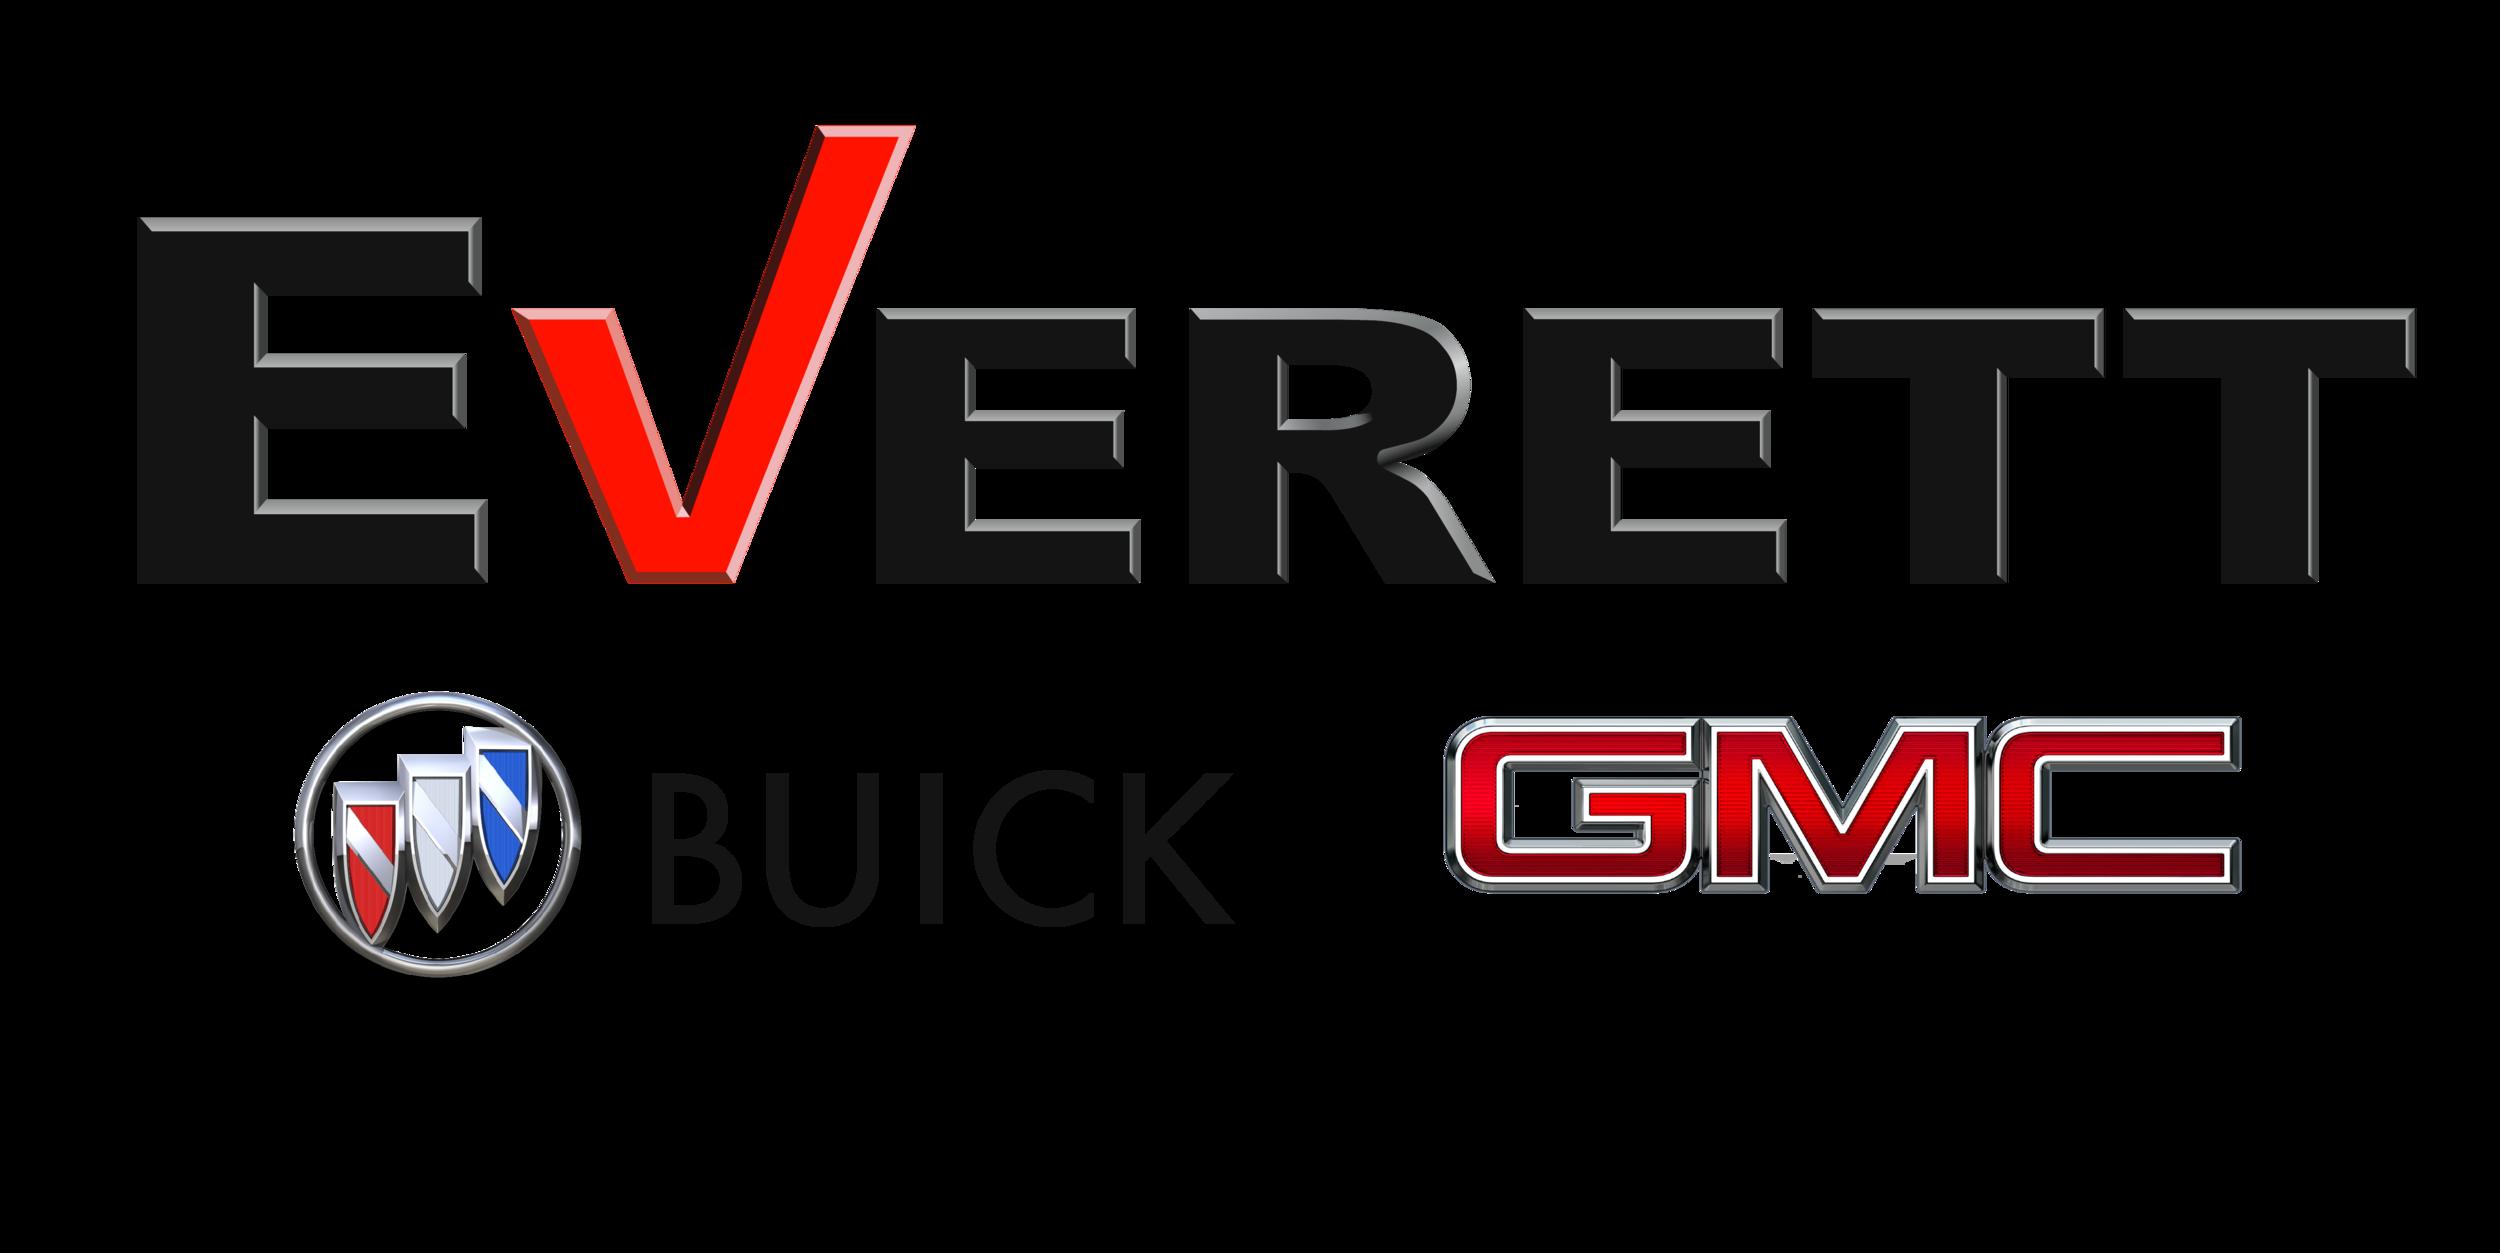 NEW Everett Logo 2010 JPEG-2-01.png